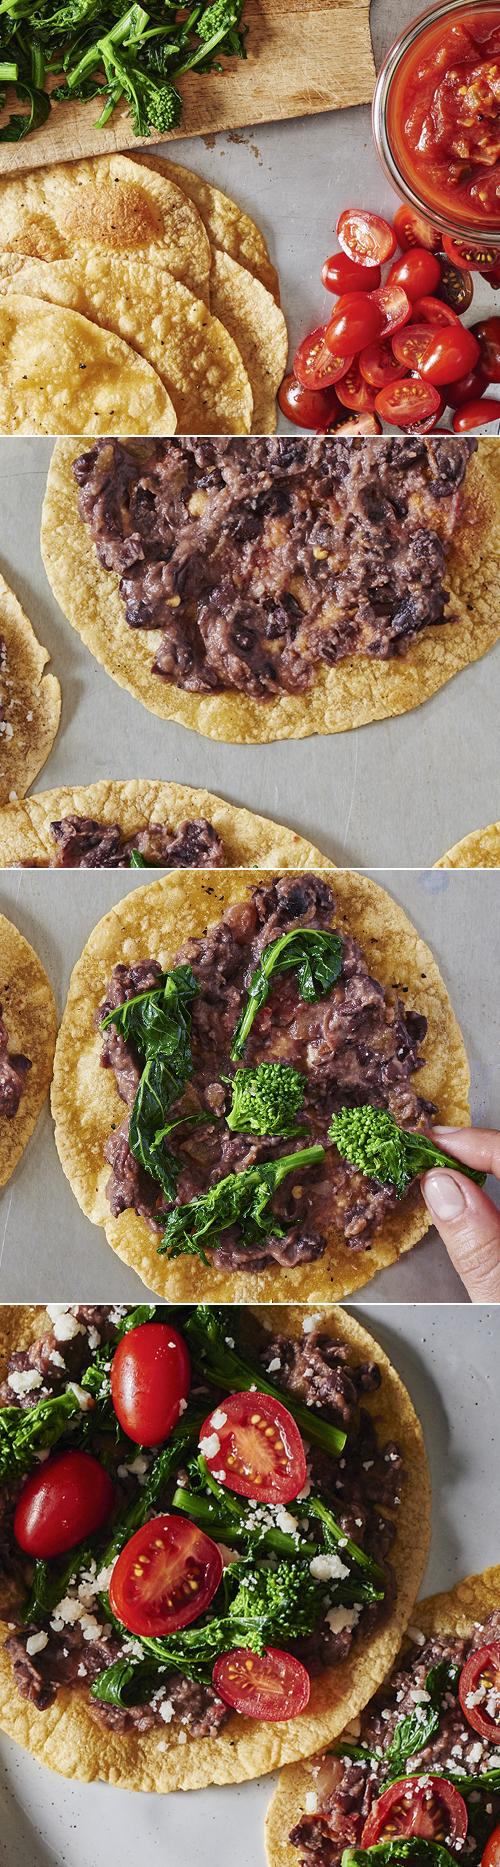 ab_pinterest_processpin_tortillapizzas